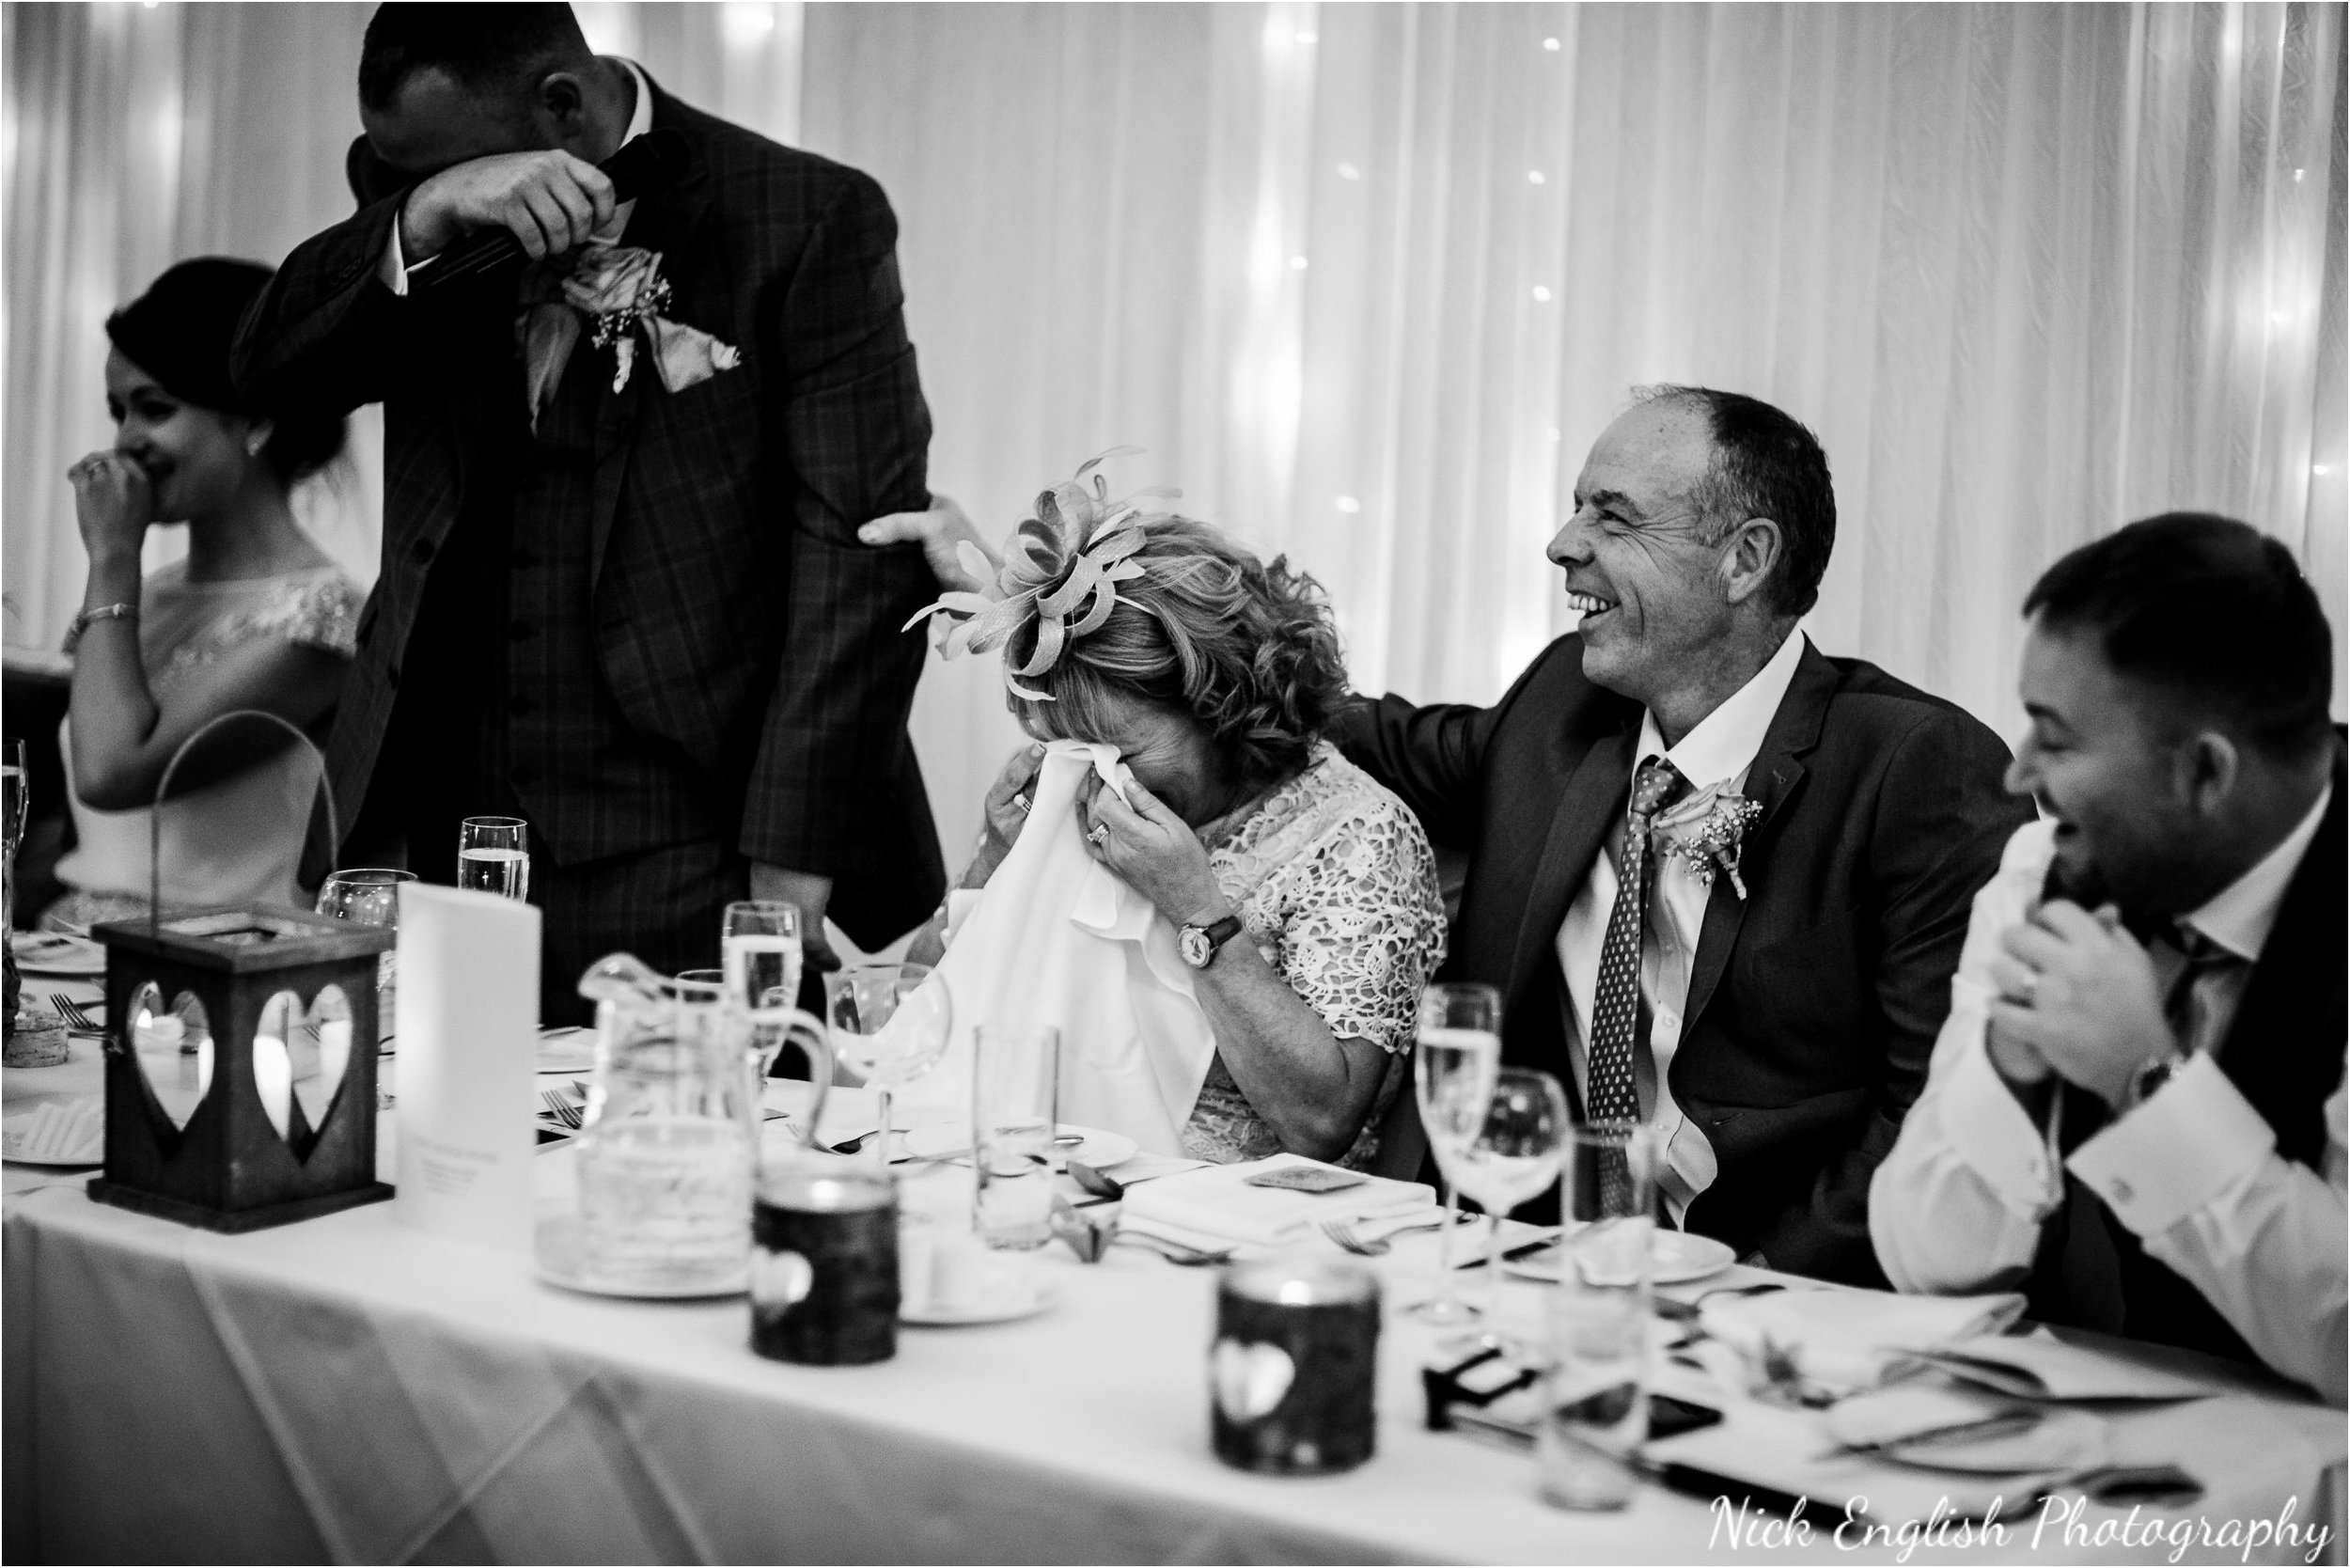 Stacey-Ash-Wedding-Photographs-Stanley-House-Preston-Lancashire-166.jpg